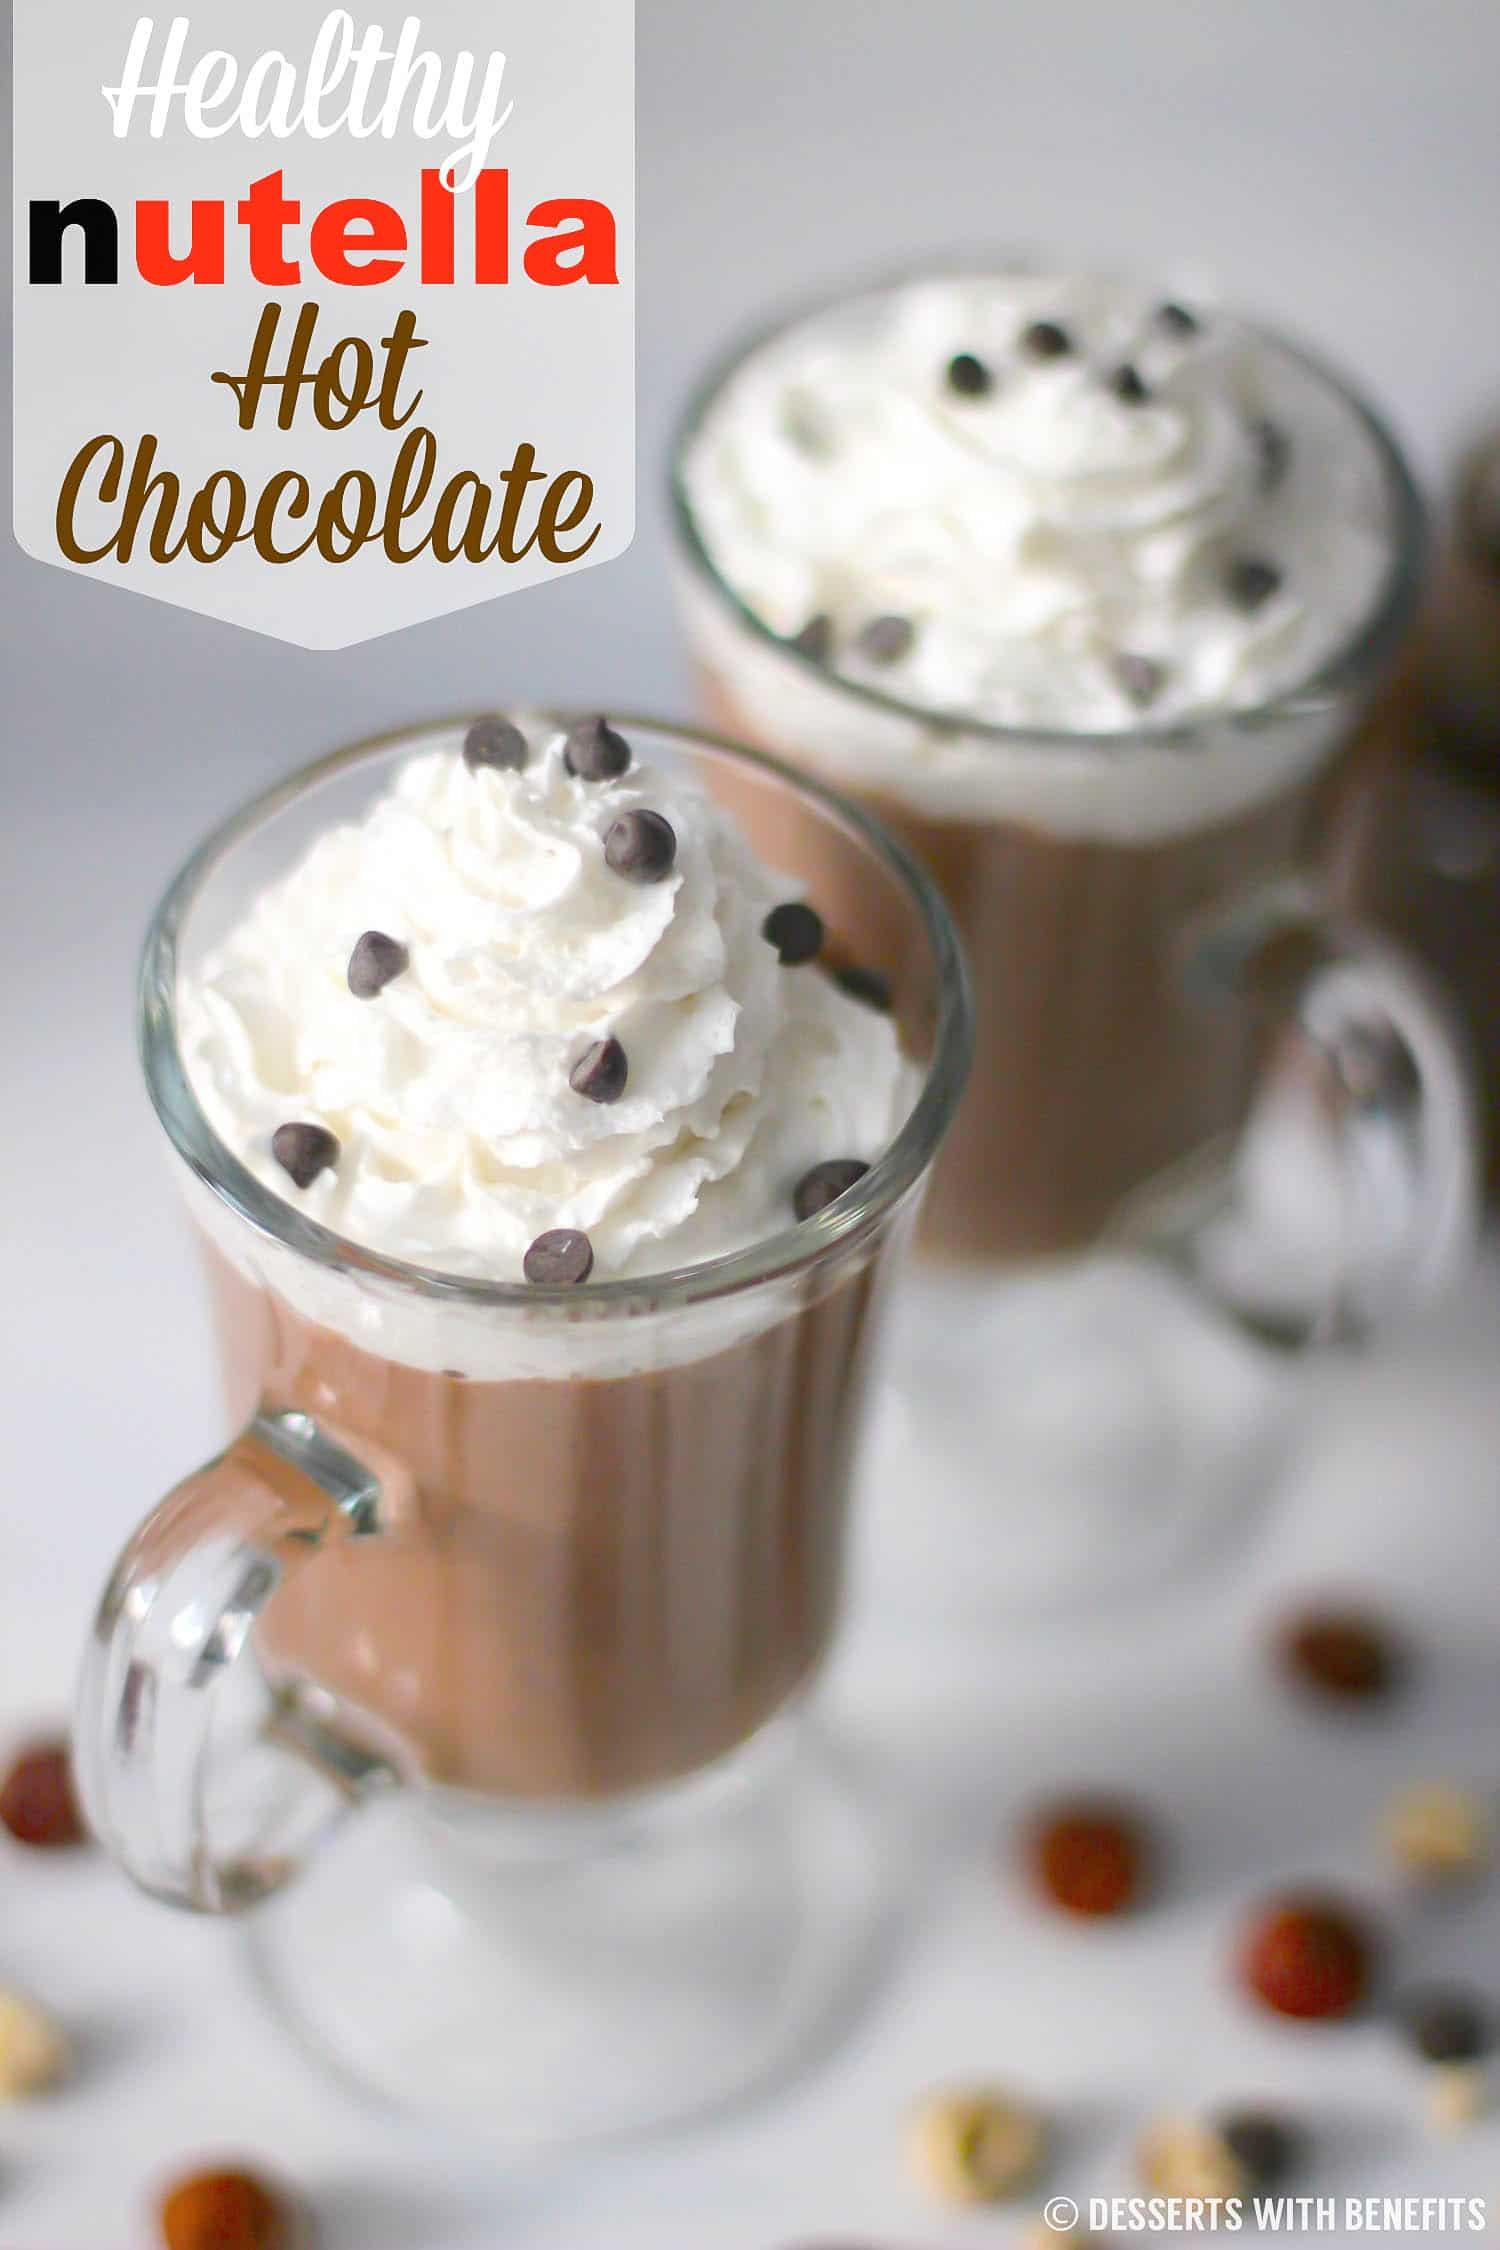 Healthy Nutella Hot Chocolate Sugar Free Low Carb Vegan